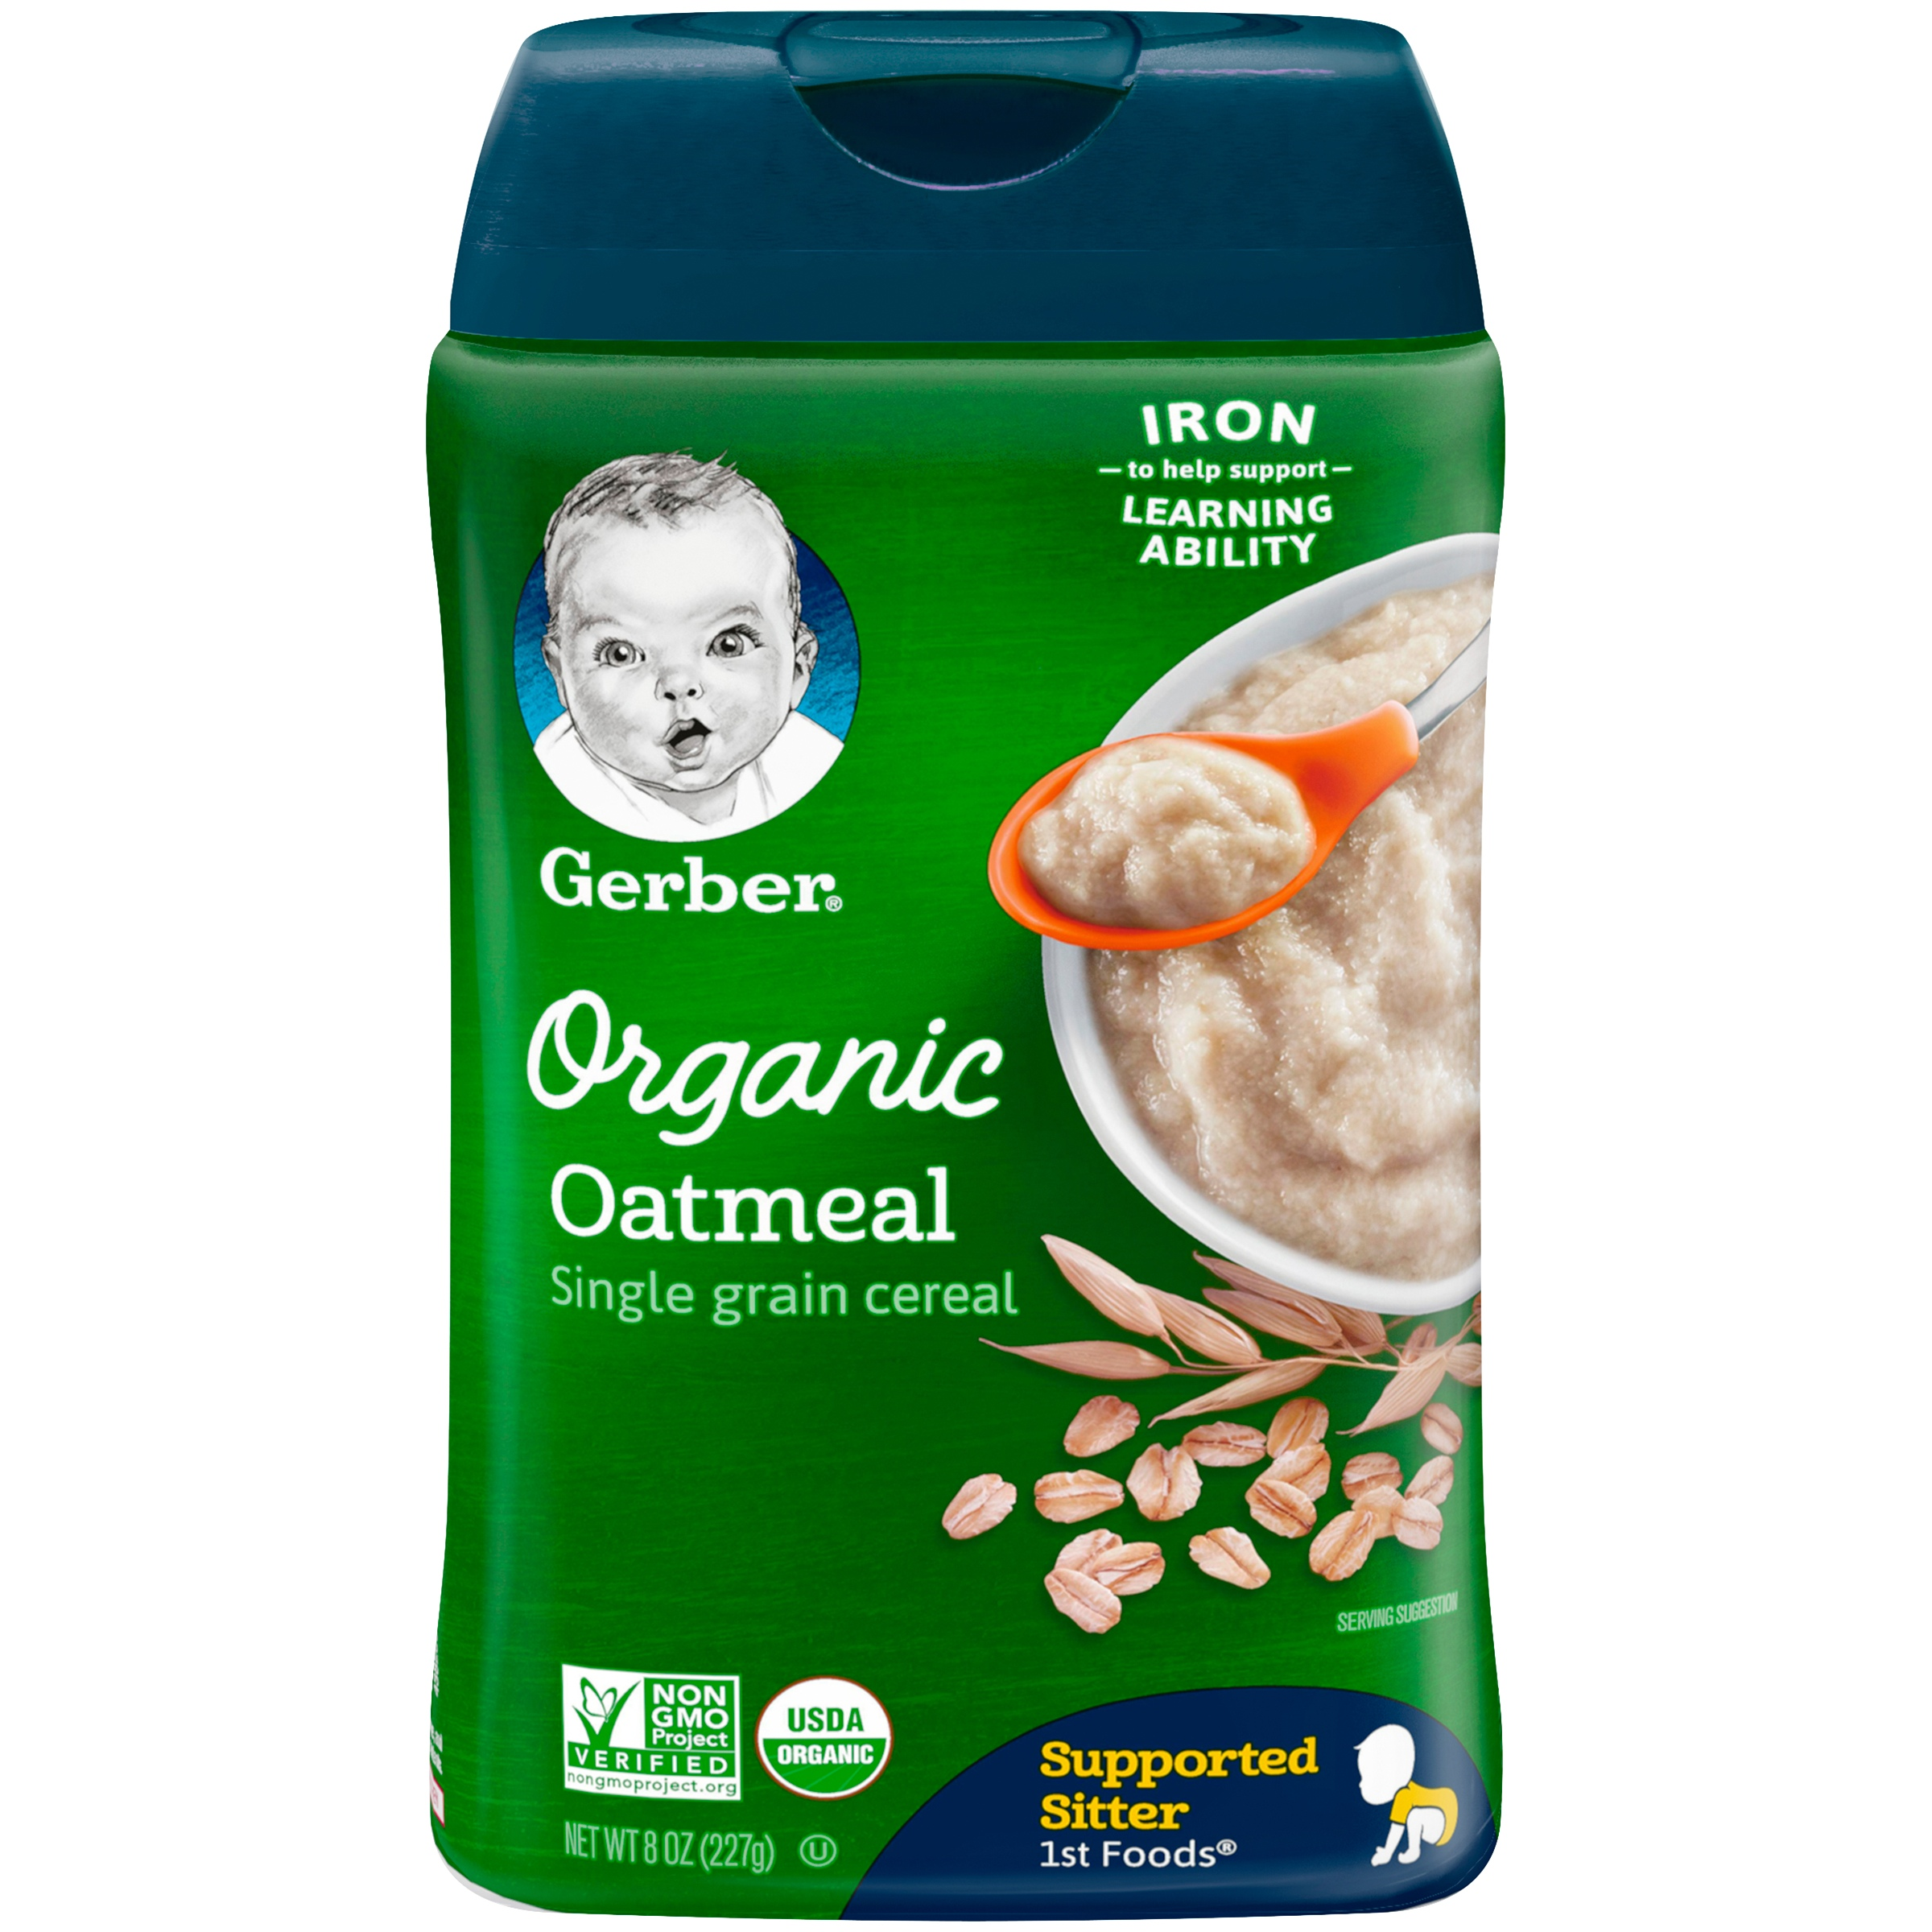 Gerber Organic Single-Grain Oatmeal Baby Cereal, 8 oz